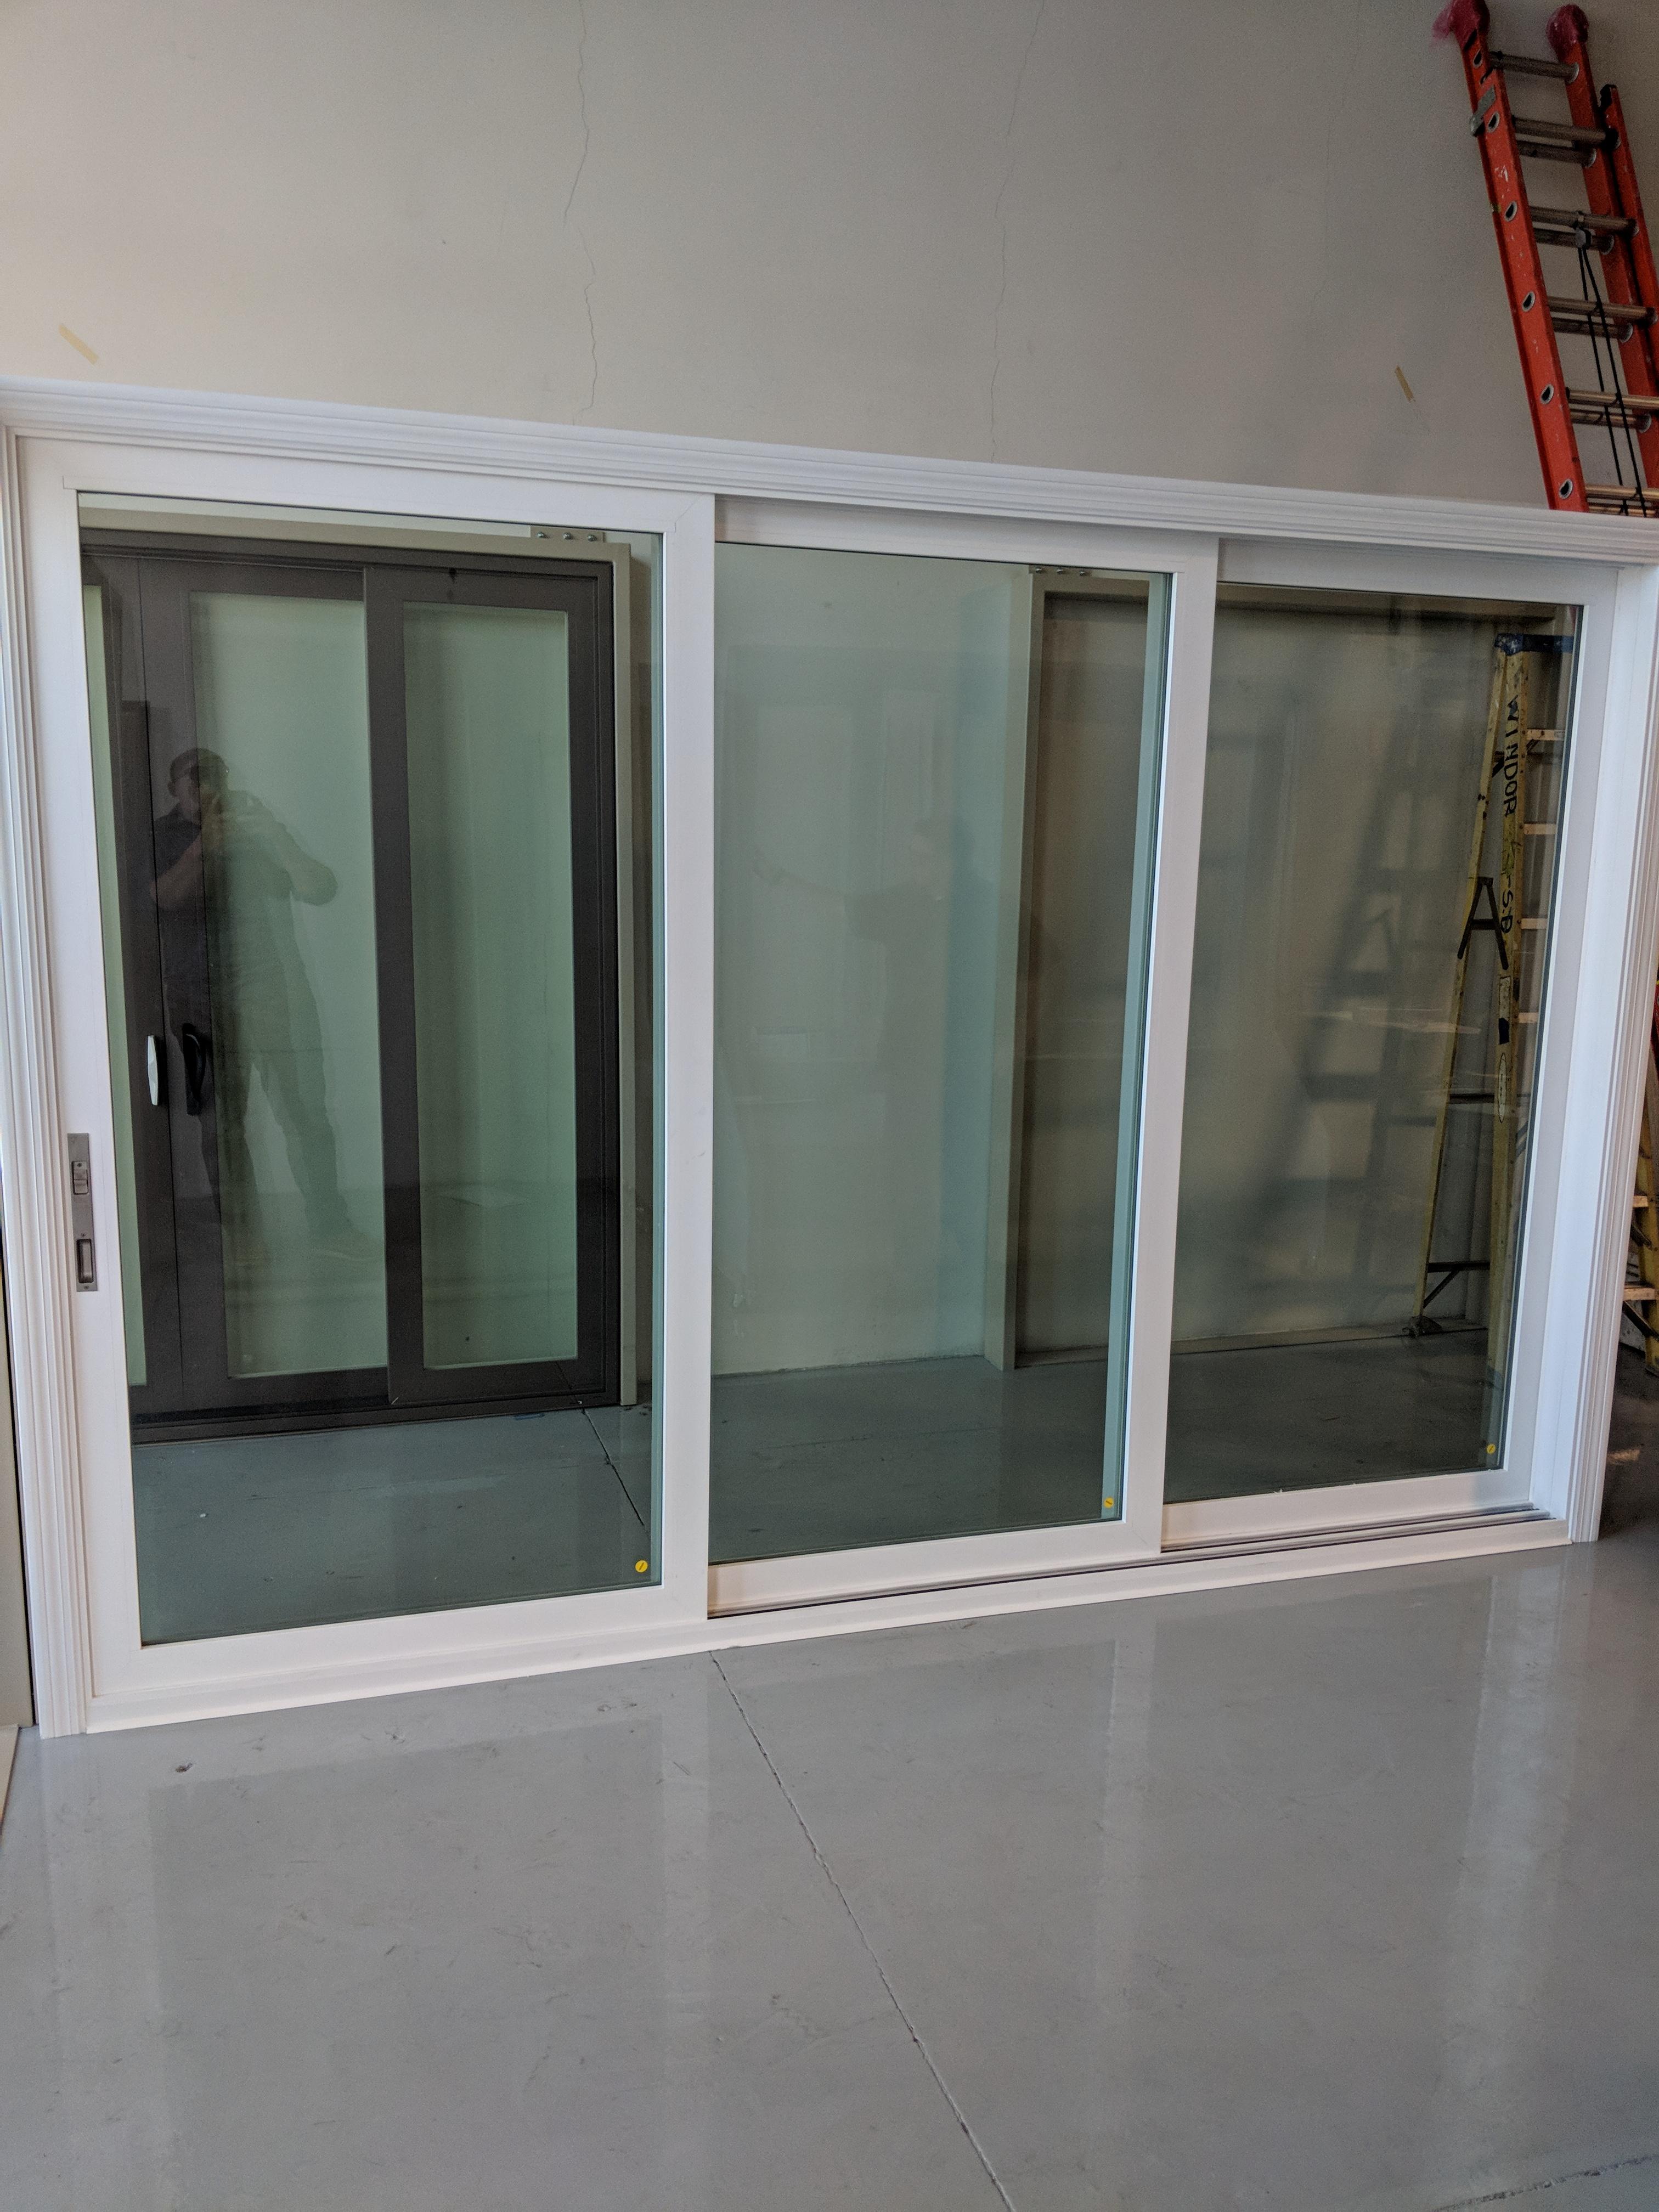 Window Repair Near Me >> Sliding Window Cheap Window Replacement Near Me